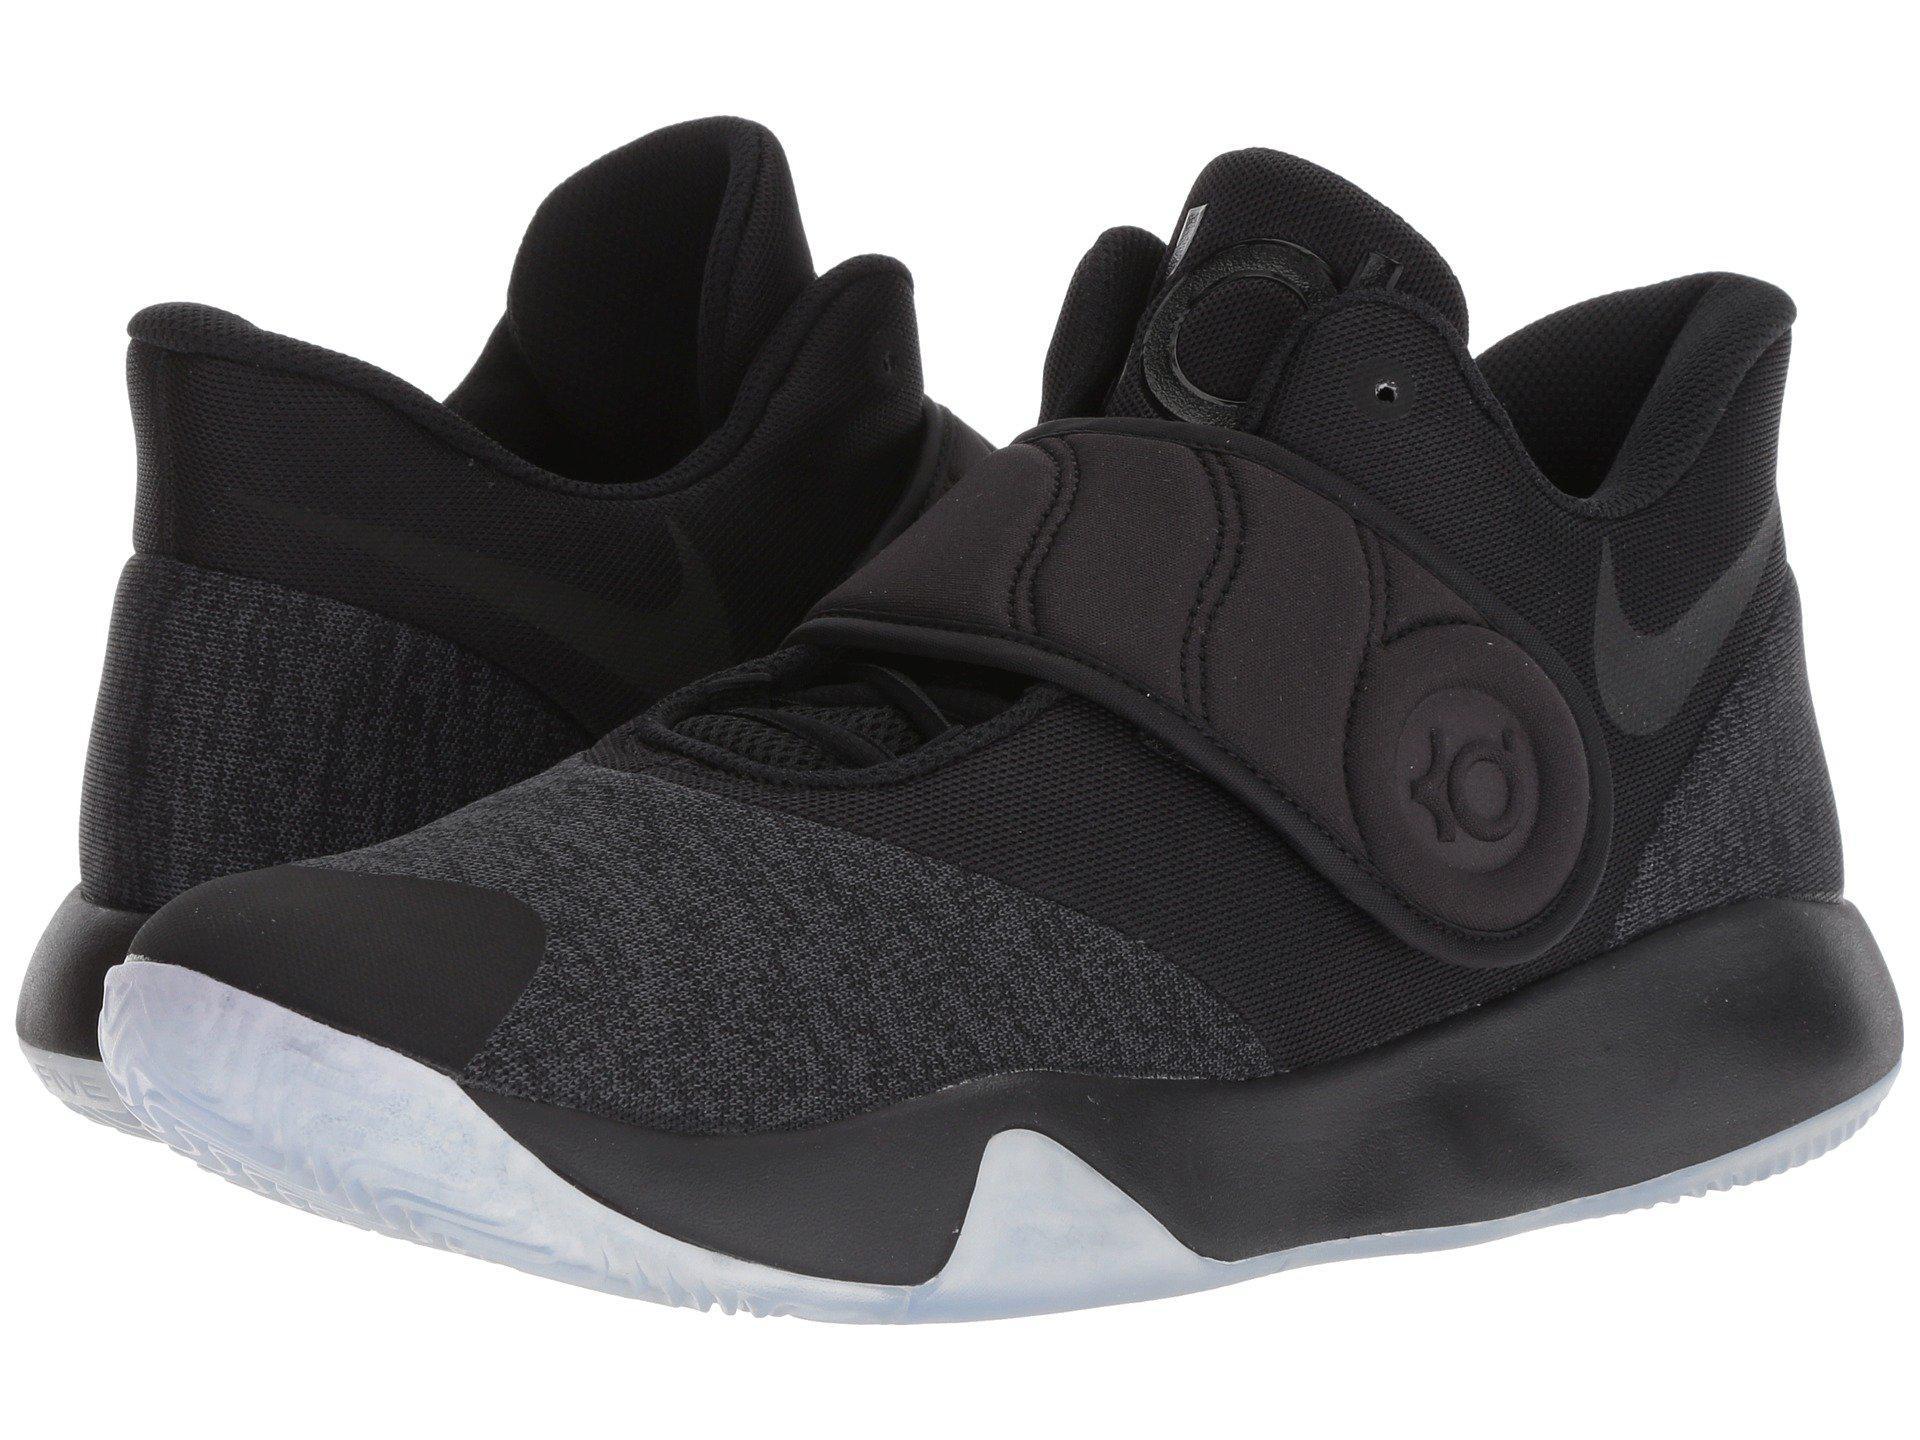 8deeee583f7 sale nike air basketball shoeskevin durant basketball shoesnike kd trey  29733 30f62  release date nike. kd trey 5 c6c98 73300